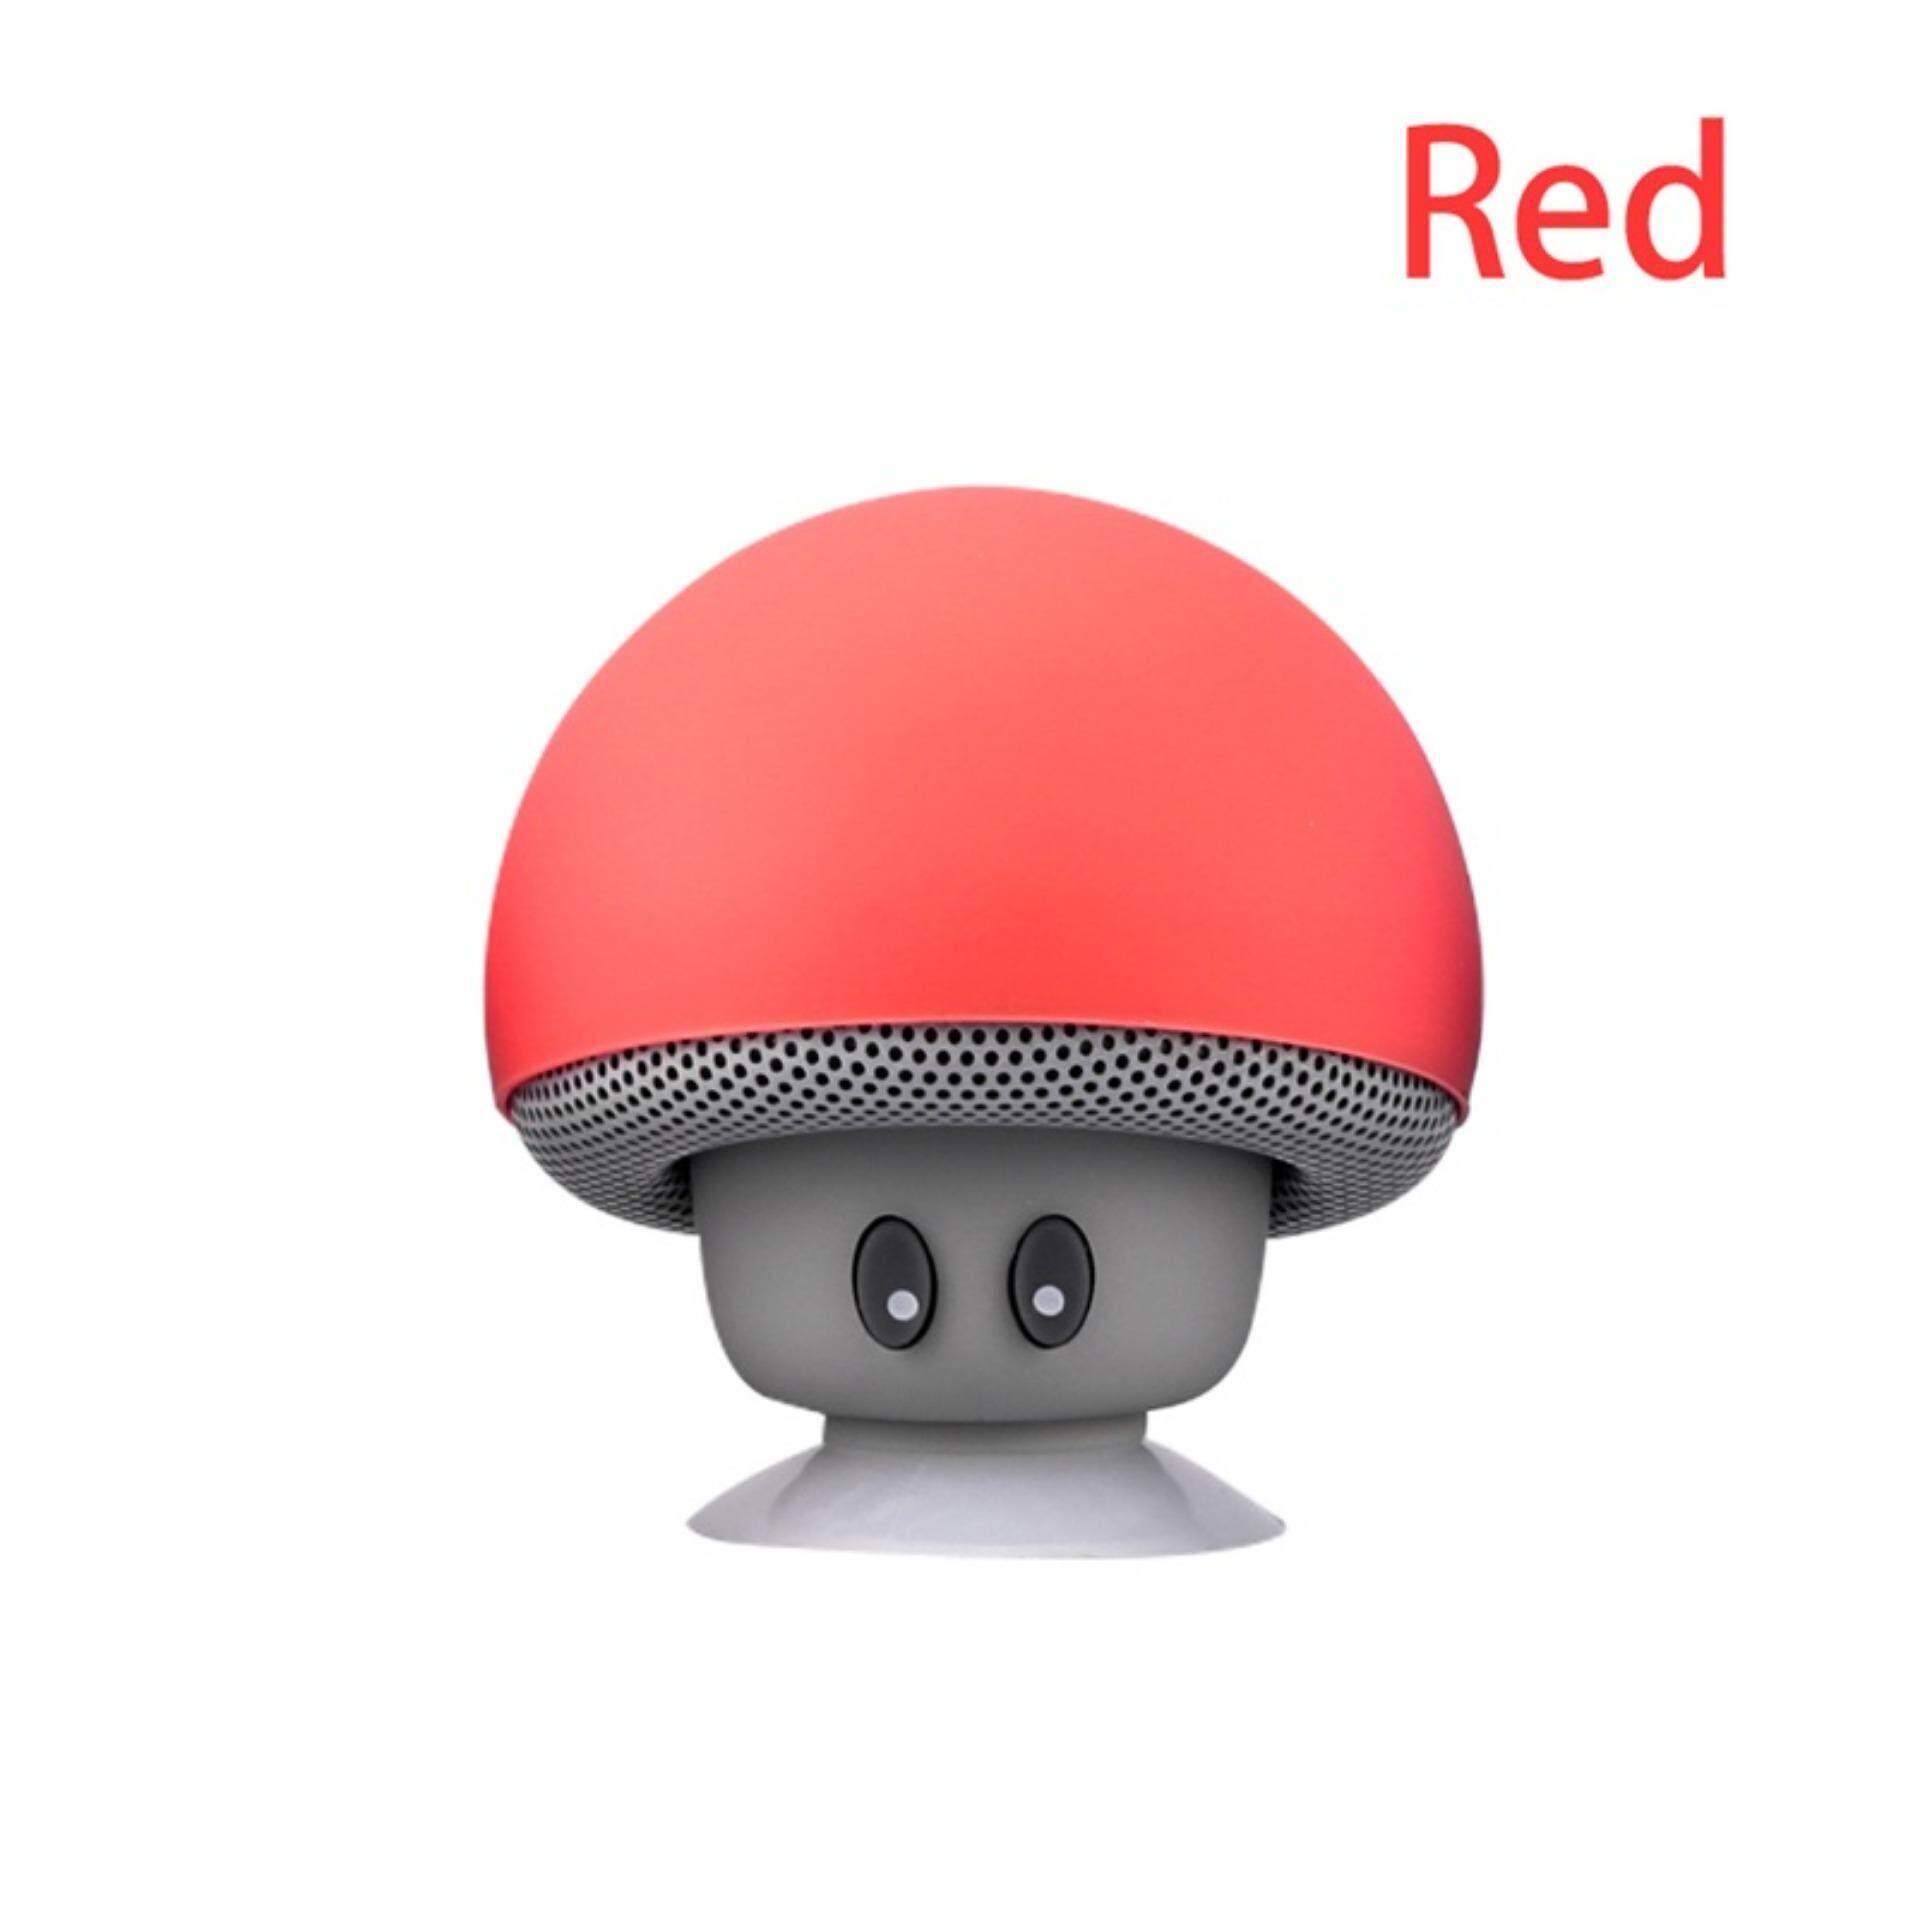 Mushroom Bluetooth Speaker Stereo Mini Mikrofon untuk Ponsel Meja PC Laptop Telepon Pintar Merah